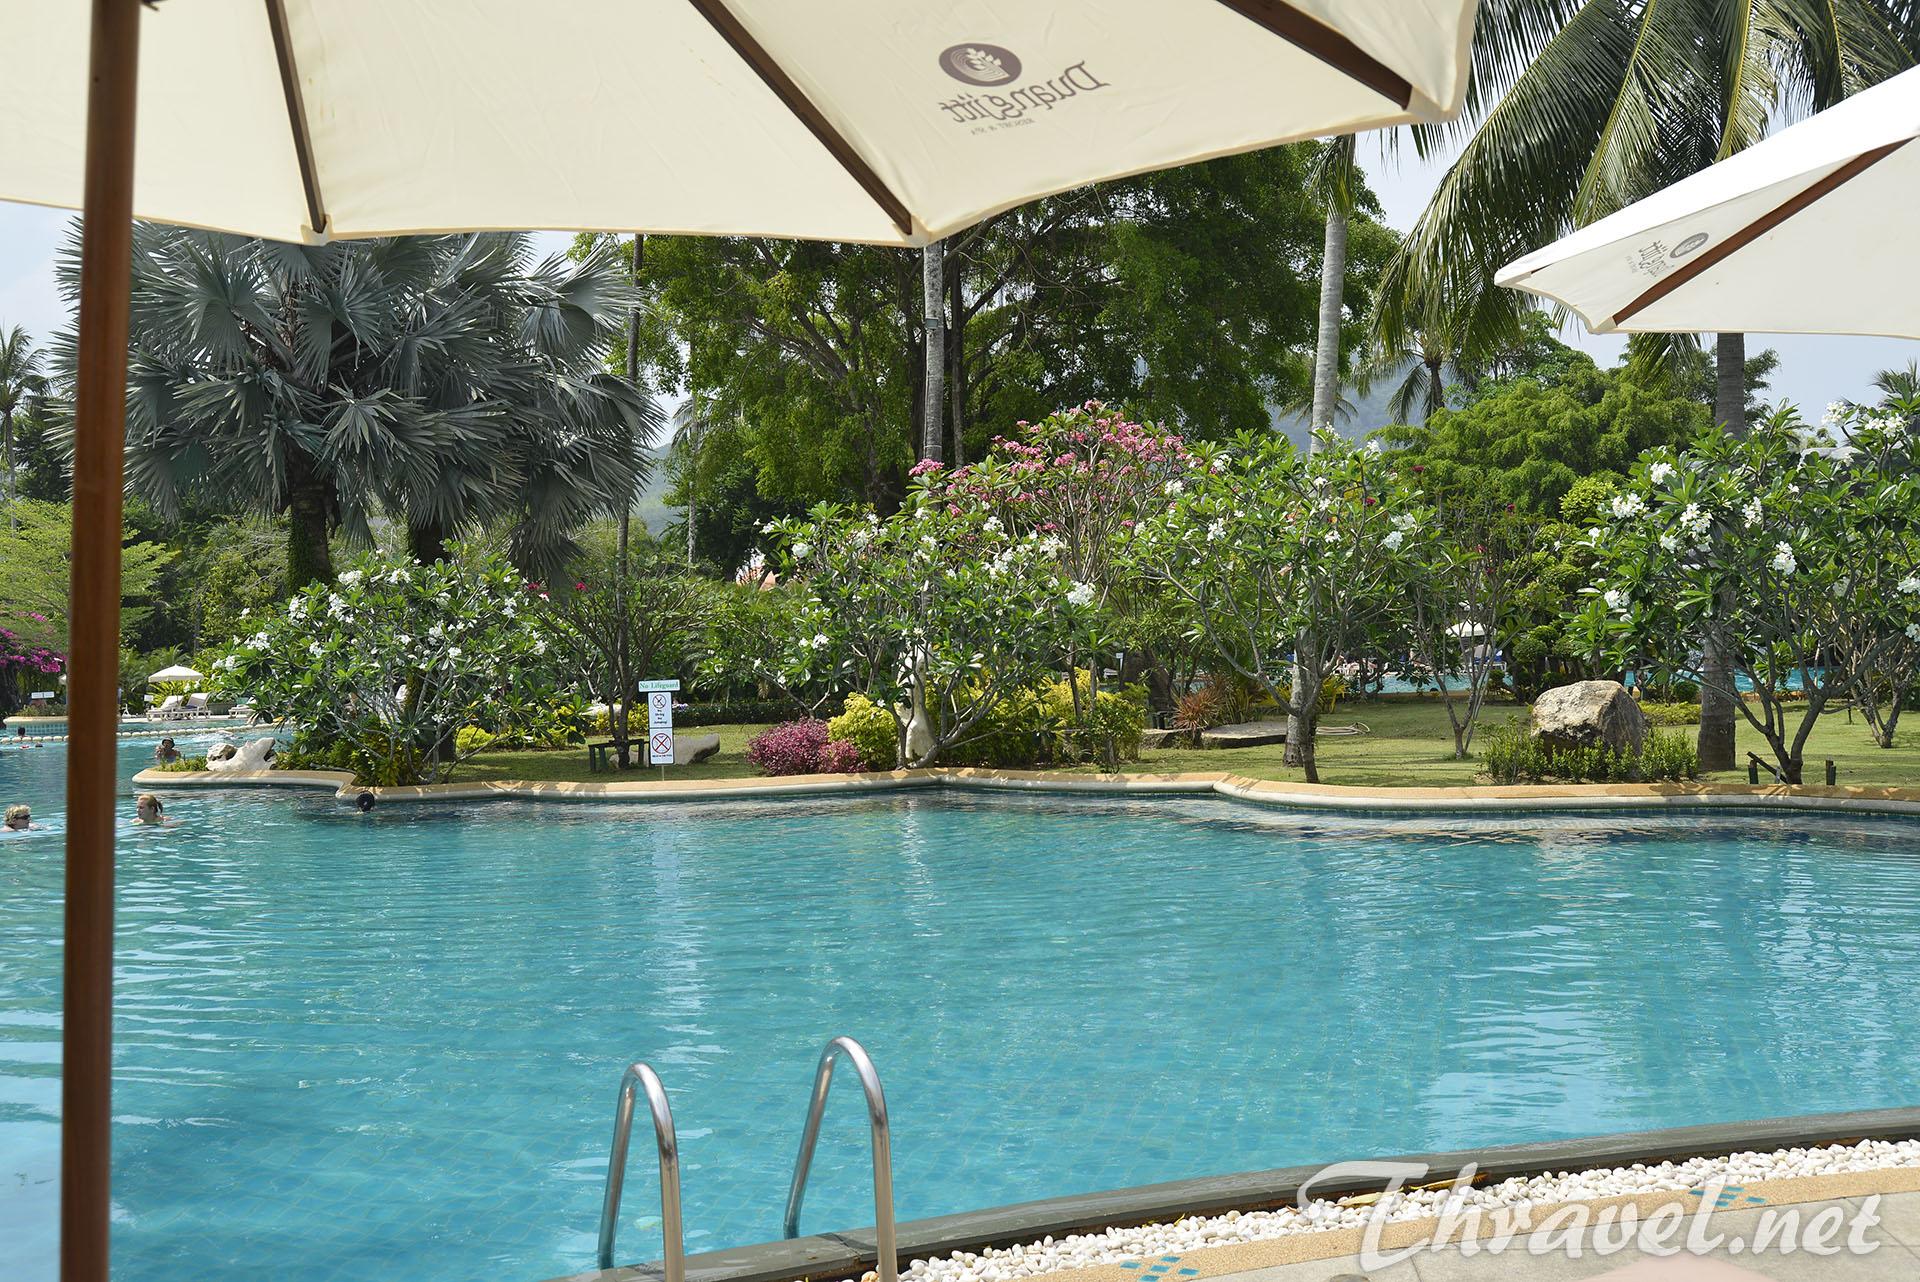 duangjitt-resort-and-spa-hotel-patong-beach-phuket-thailand-35